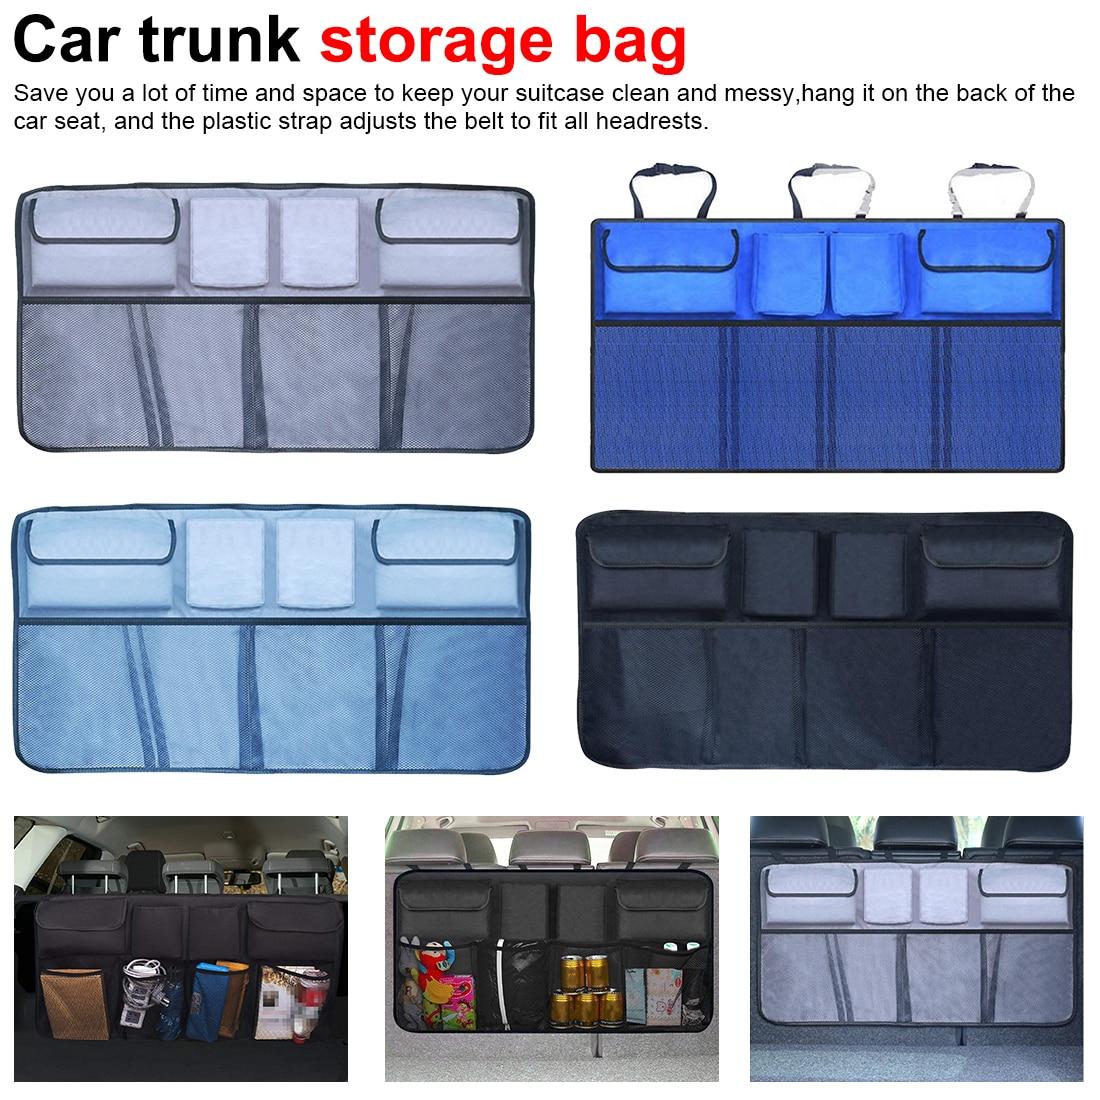 Car Trunk Organizer Adjustable Backseat Storage Bag Net High Capacity Multi-use Seat Back Organizers Universal